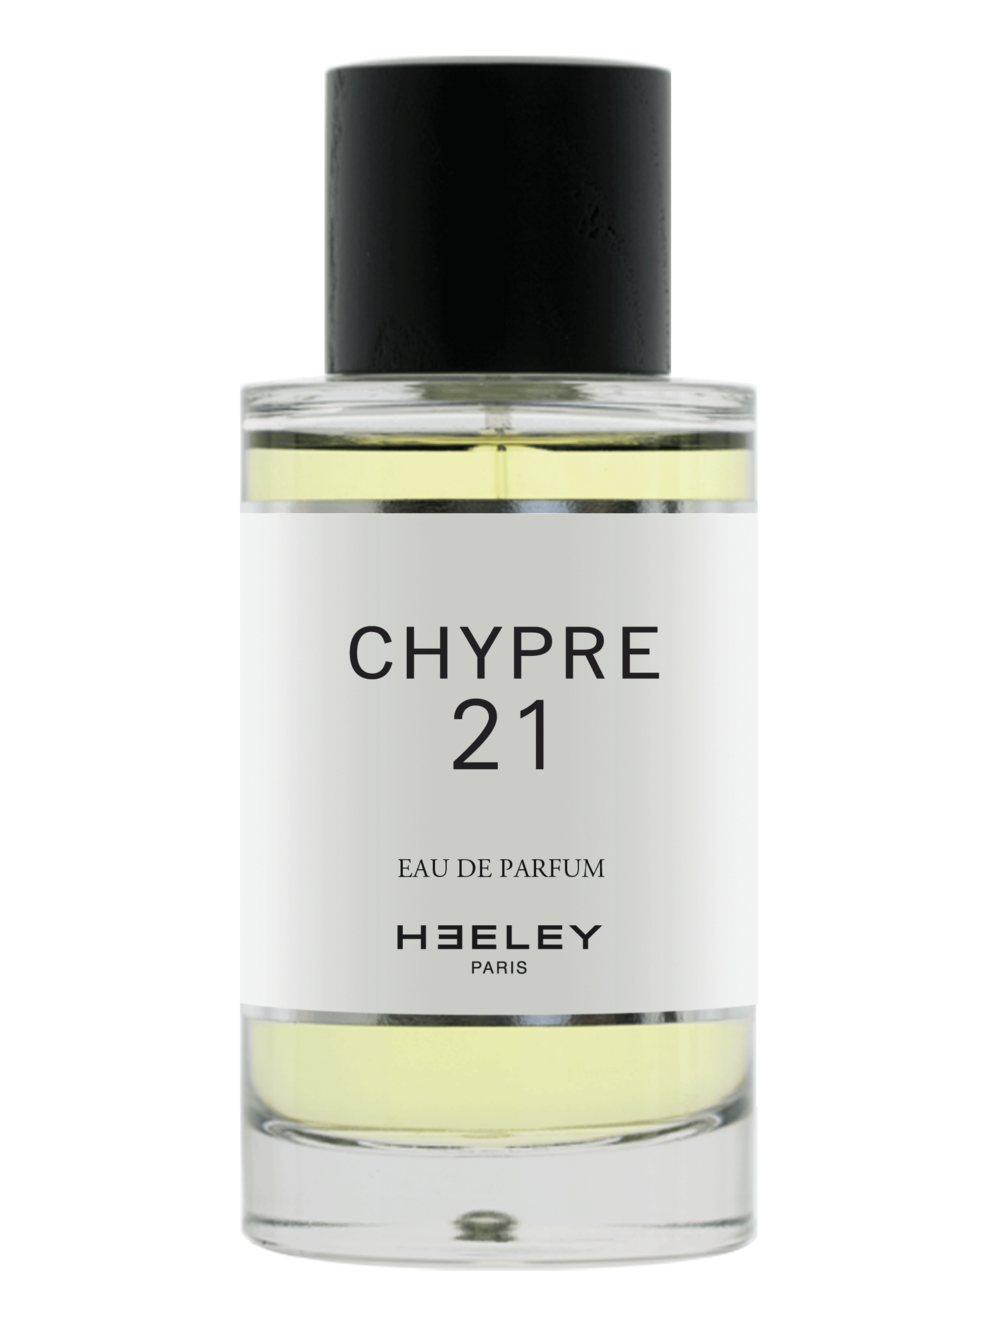 Heeley-EdP100ml-Chypre21-1800x2400.png